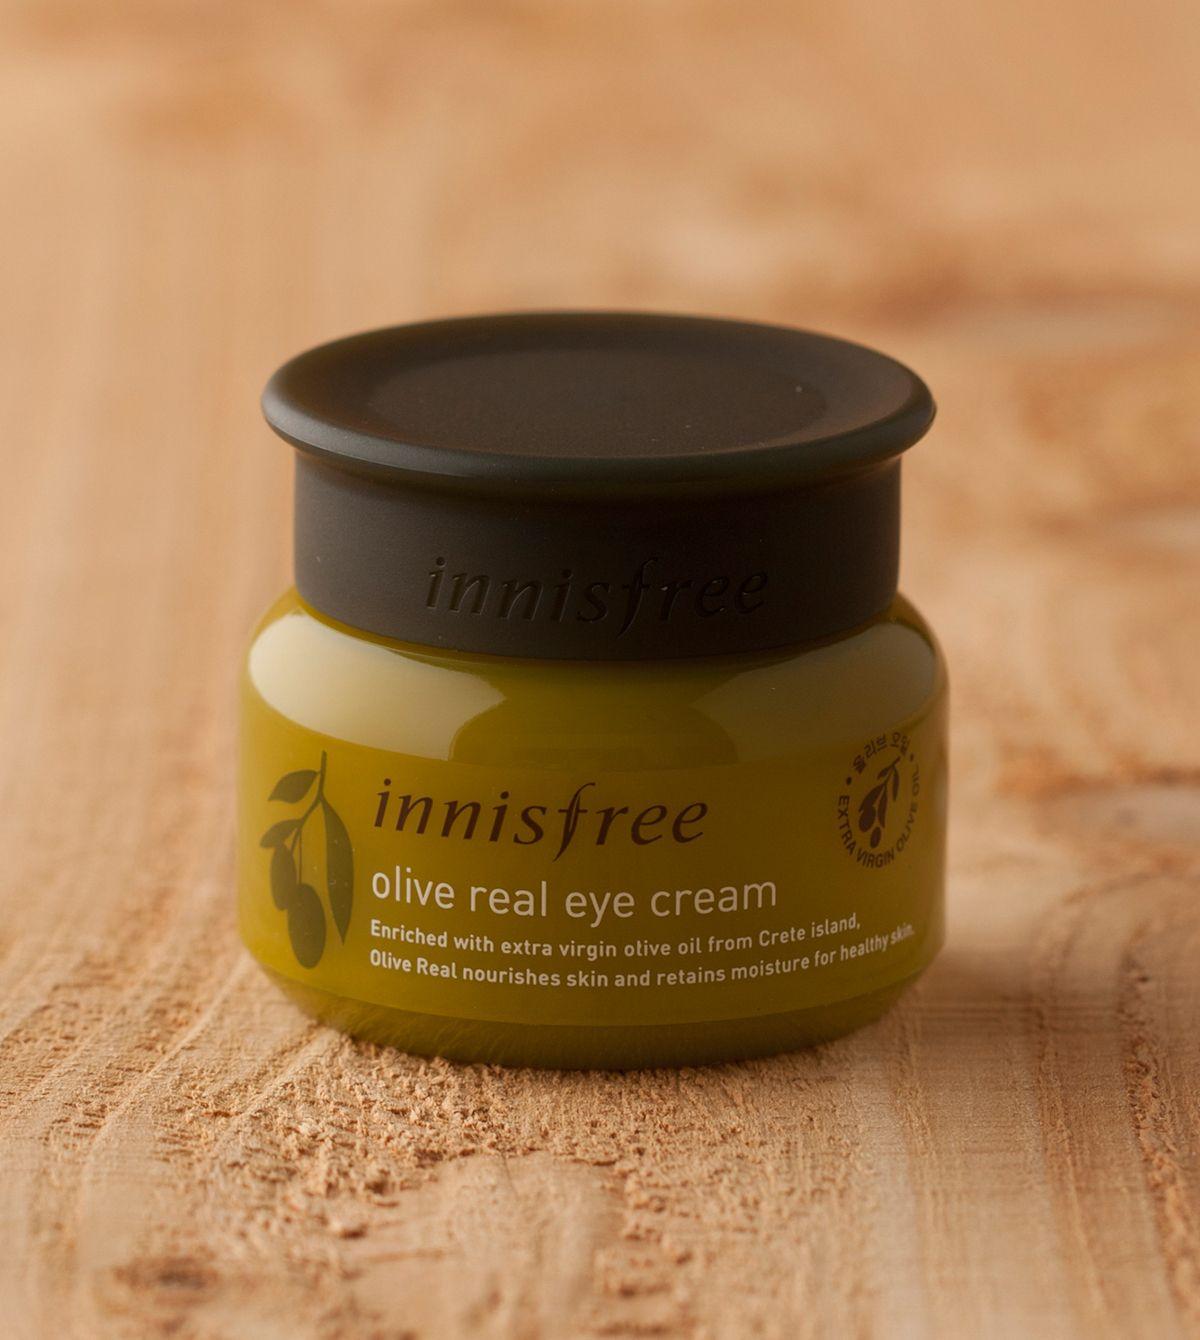 Skin Care Olive Real Eye Cream In 2020 Innisfree Moisturizing Eye Cream Skin Care